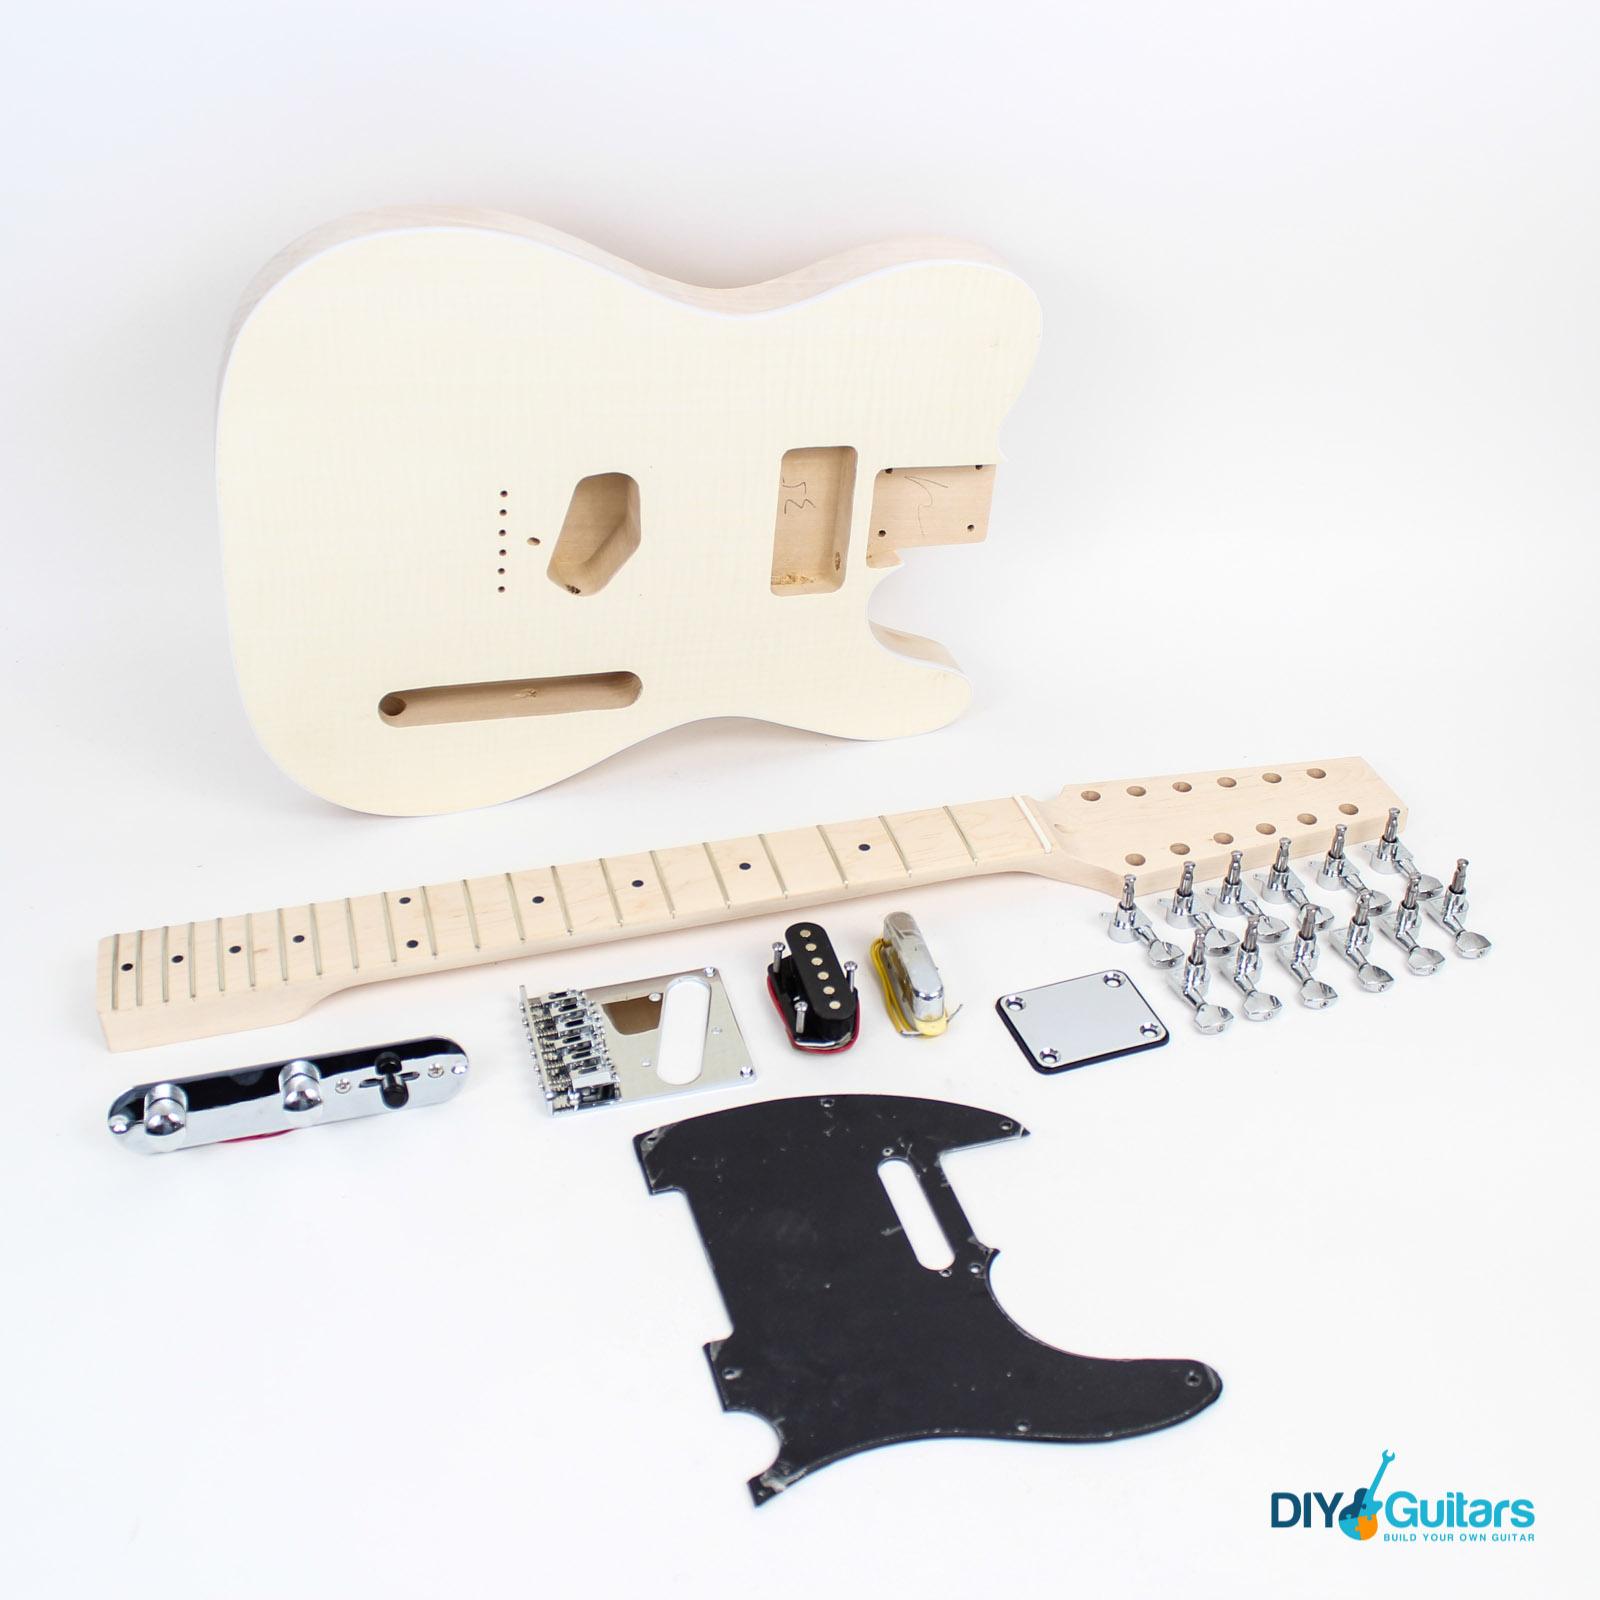 Thinline Bigsby Guitar Kit Diy Guitars Way Fender Switch Wiring Help Telecaster Forum Main Components